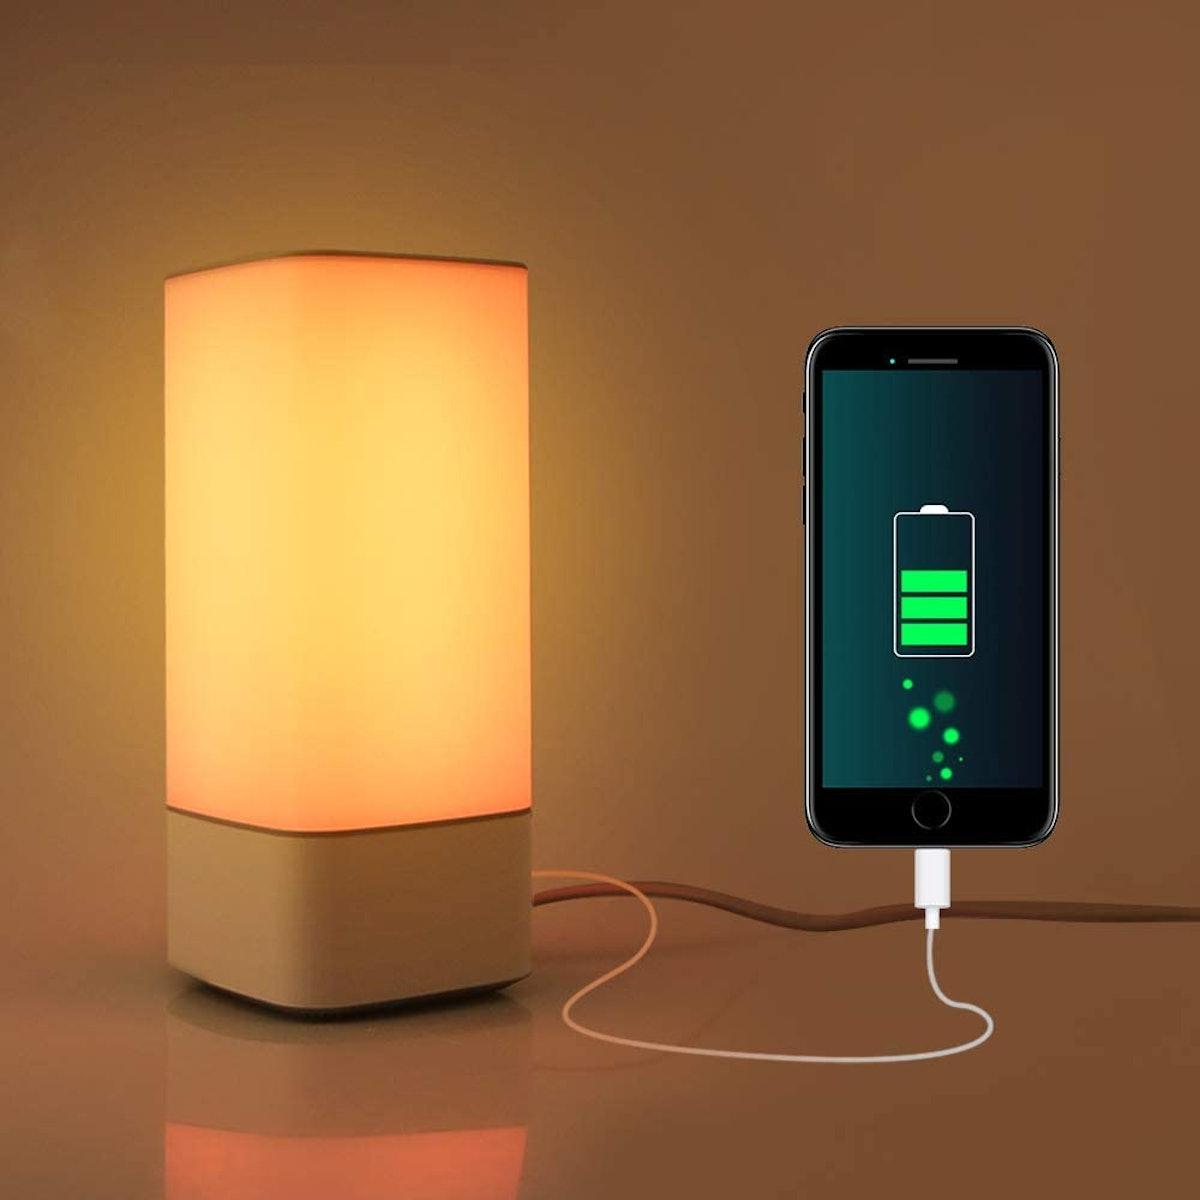 mixigoo Touch-Sensor Table Lamp